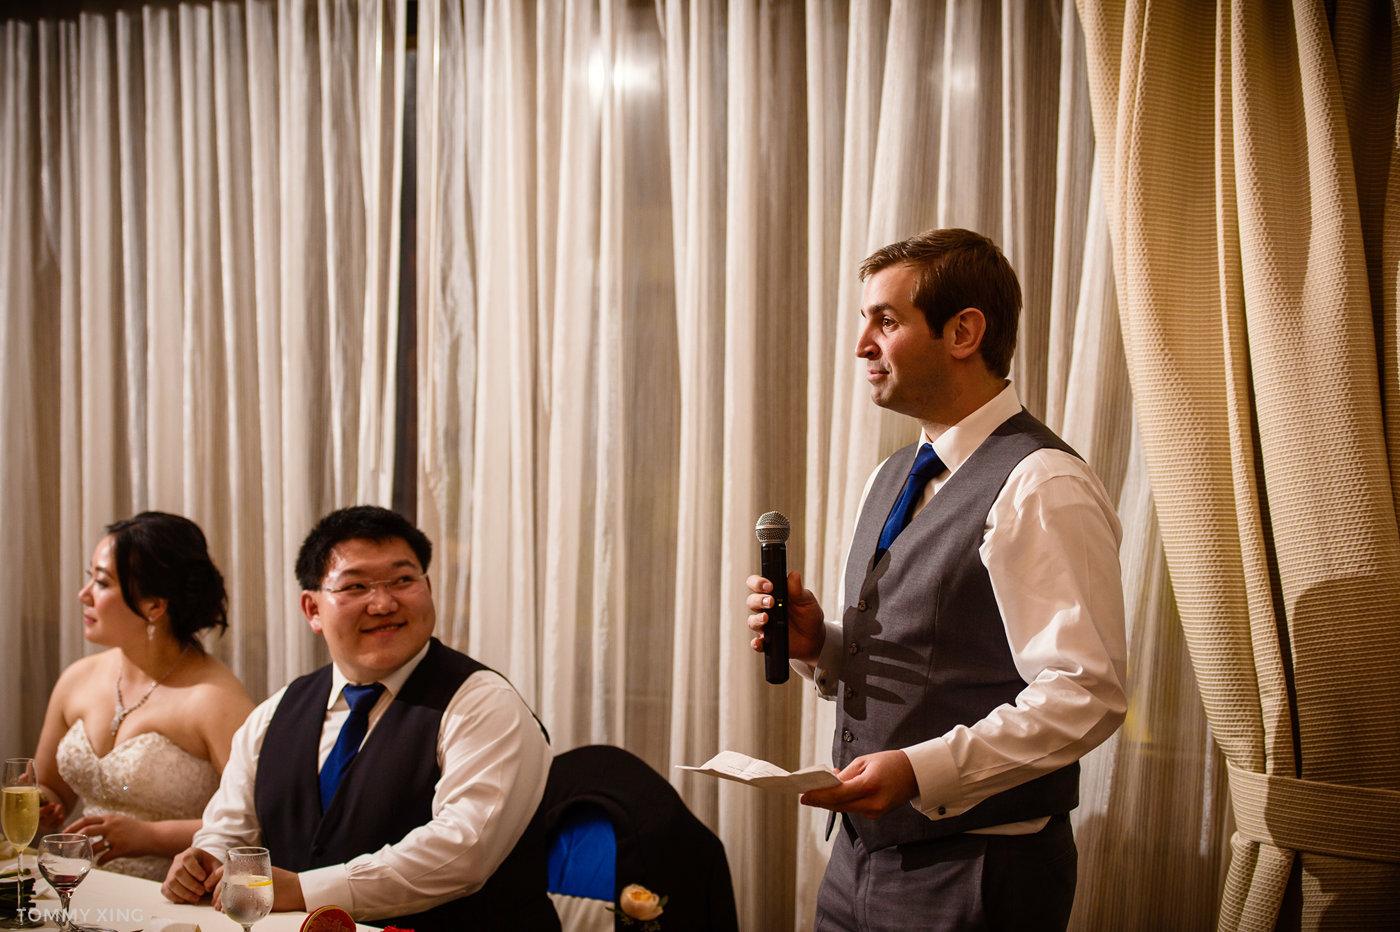 STANFORD MEMORIAL CHURCH WEDDING - Wenjie & Chengcheng - SAN FRANCISCO BAY AREA 斯坦福教堂婚礼跟拍 - 洛杉矶婚礼婚纱照摄影师 Tommy Xing Photography184.jpg